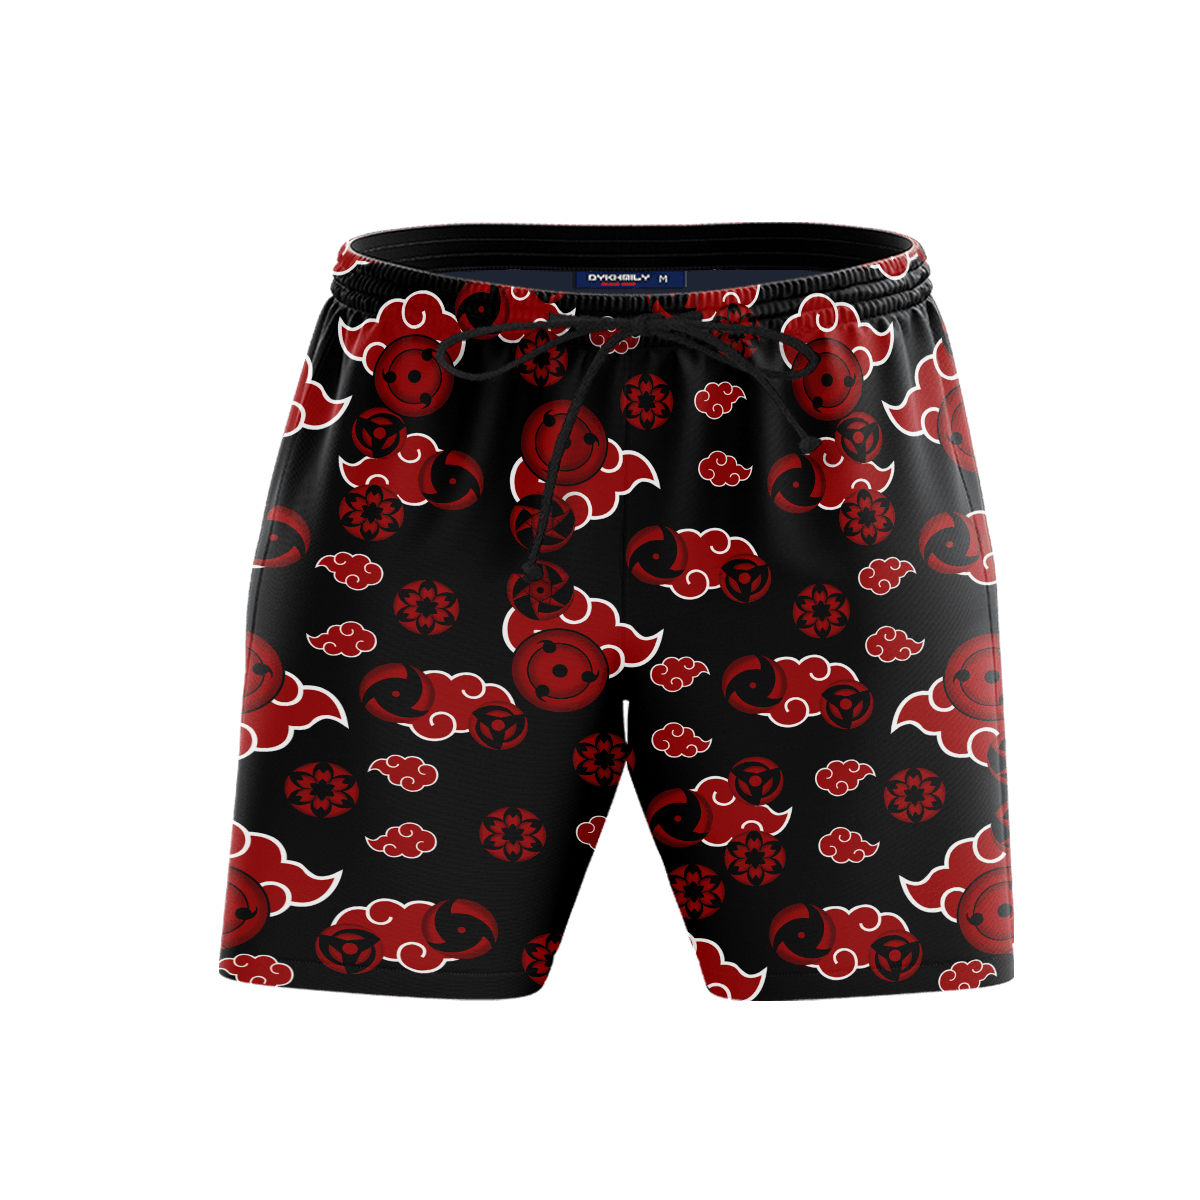 Akatsuki Sharingan Beach Shorts FDM3107 S Official Anime Swimsuit Merch